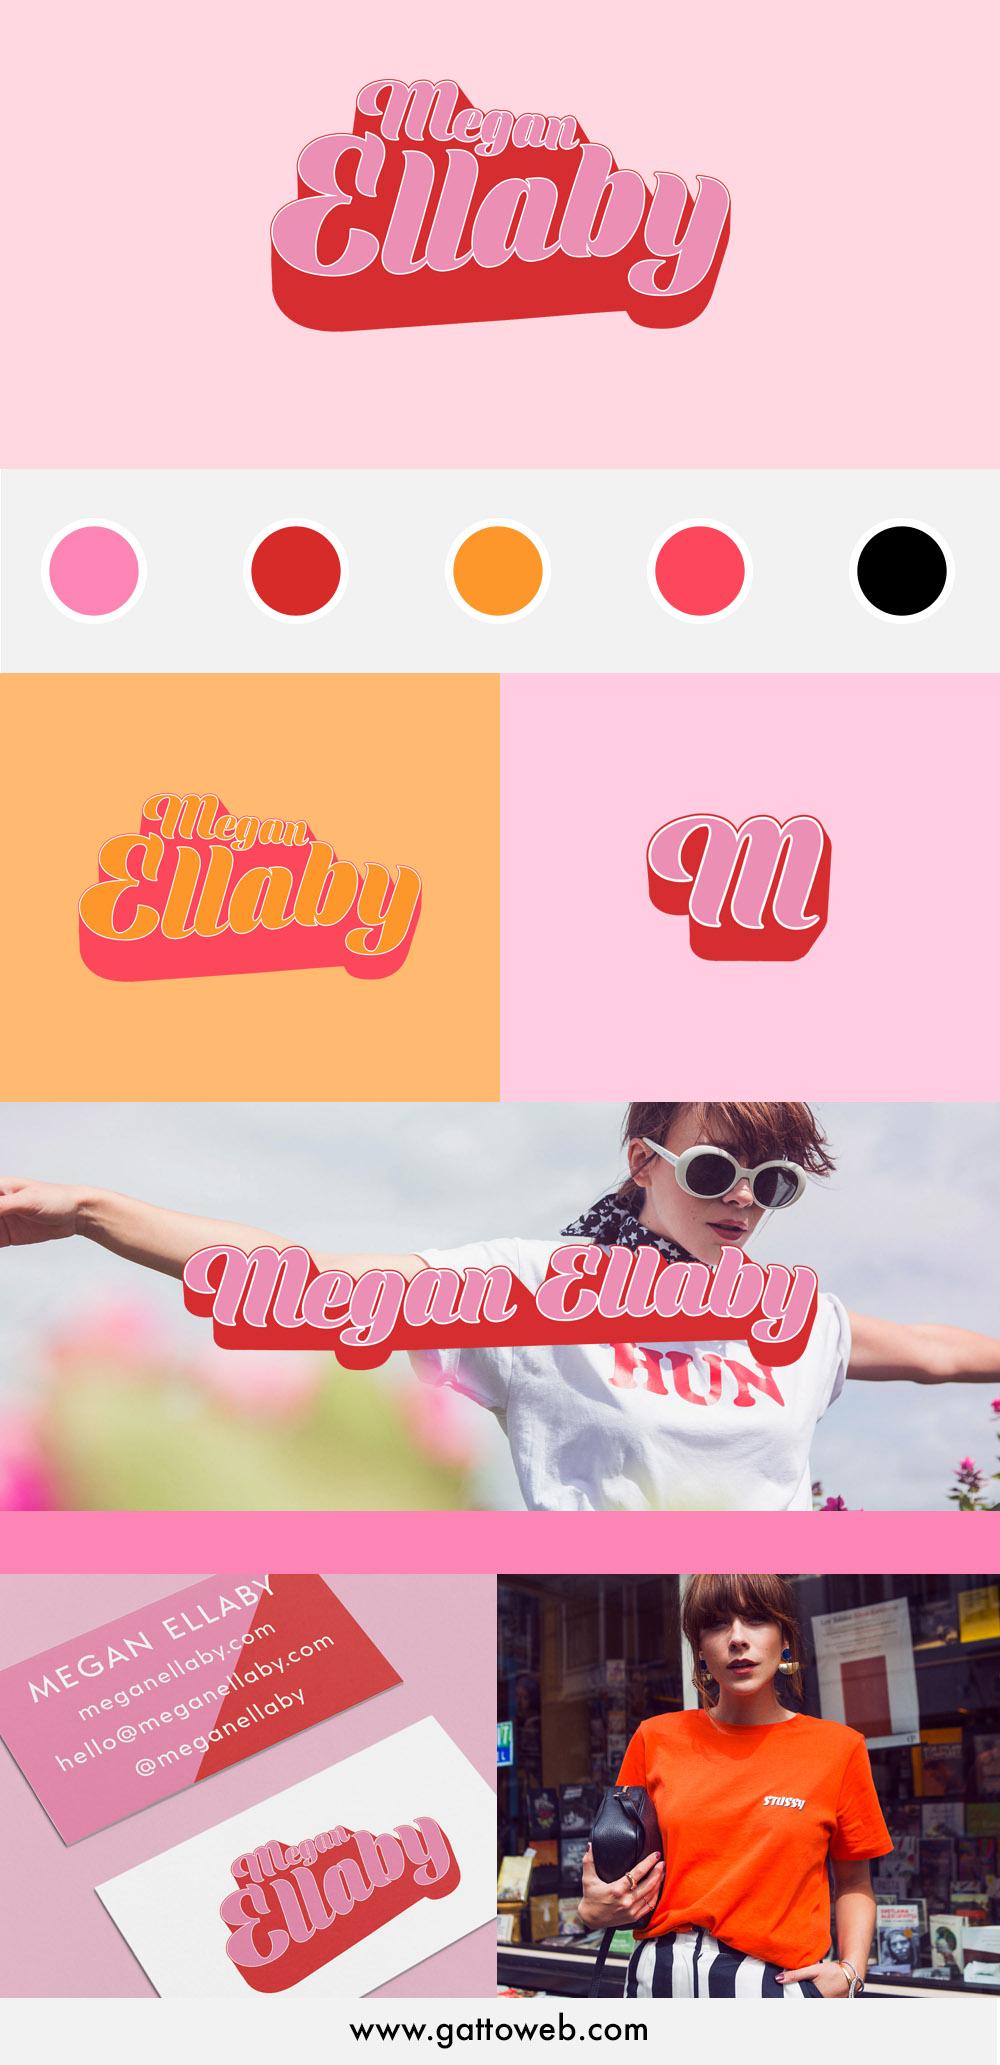 Megan Ellaby Branding Project | Retro 70s 60s branding design | Logo collateral submark | Gatto Branding and Website Design